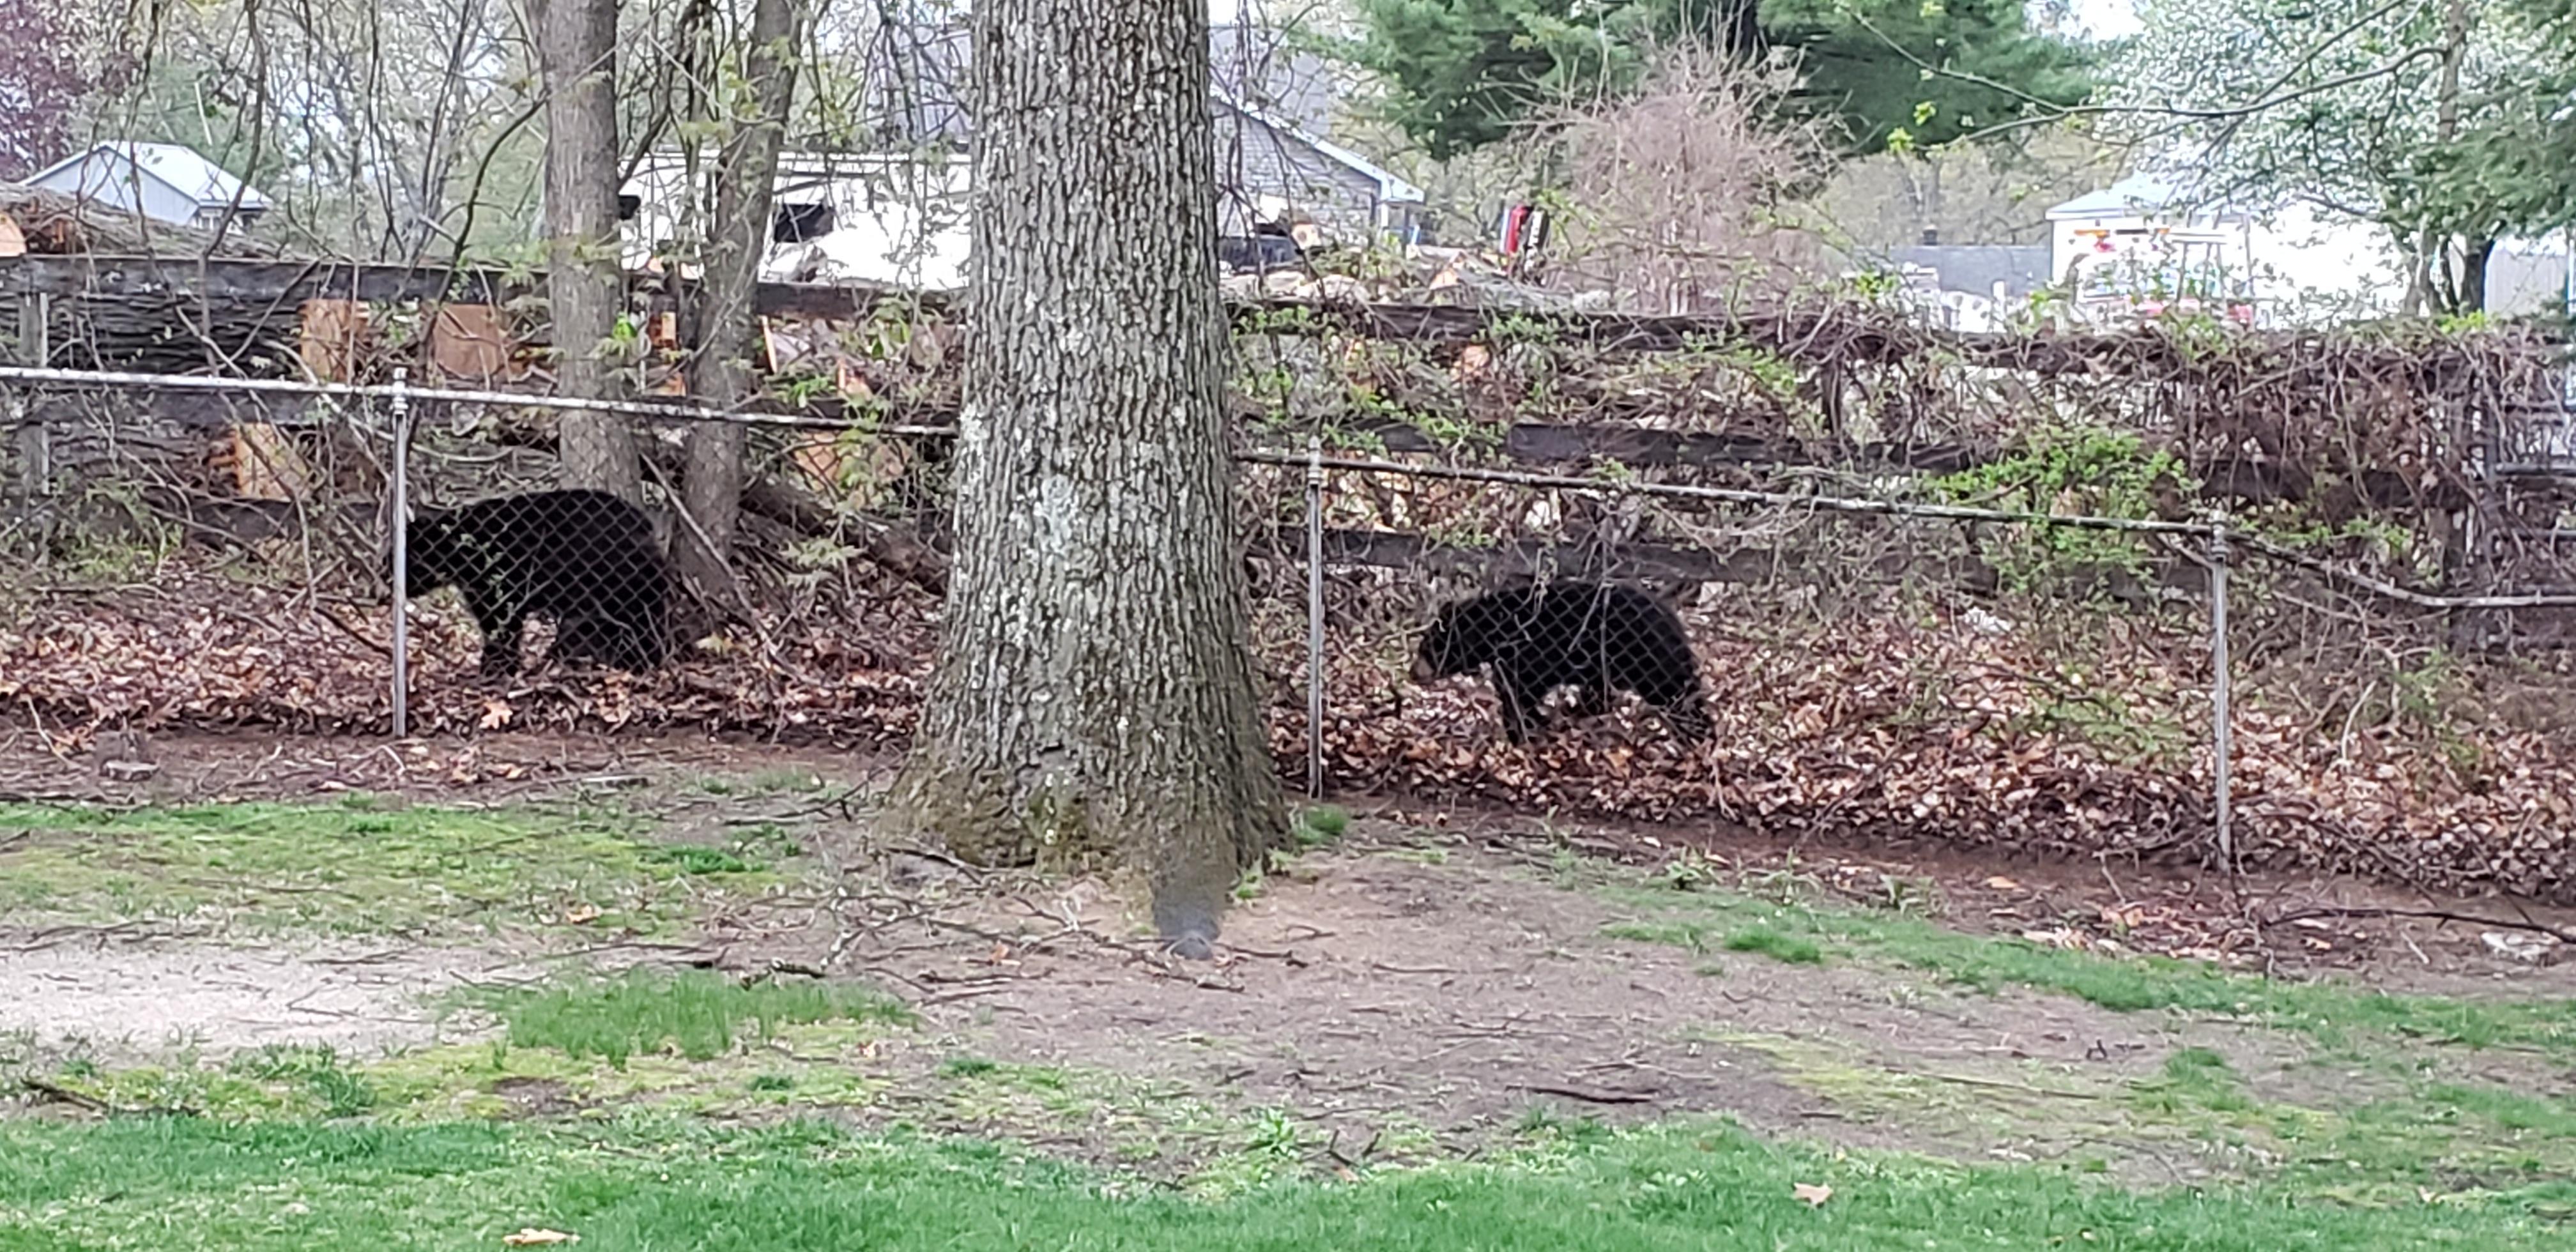 bears in Chicopee